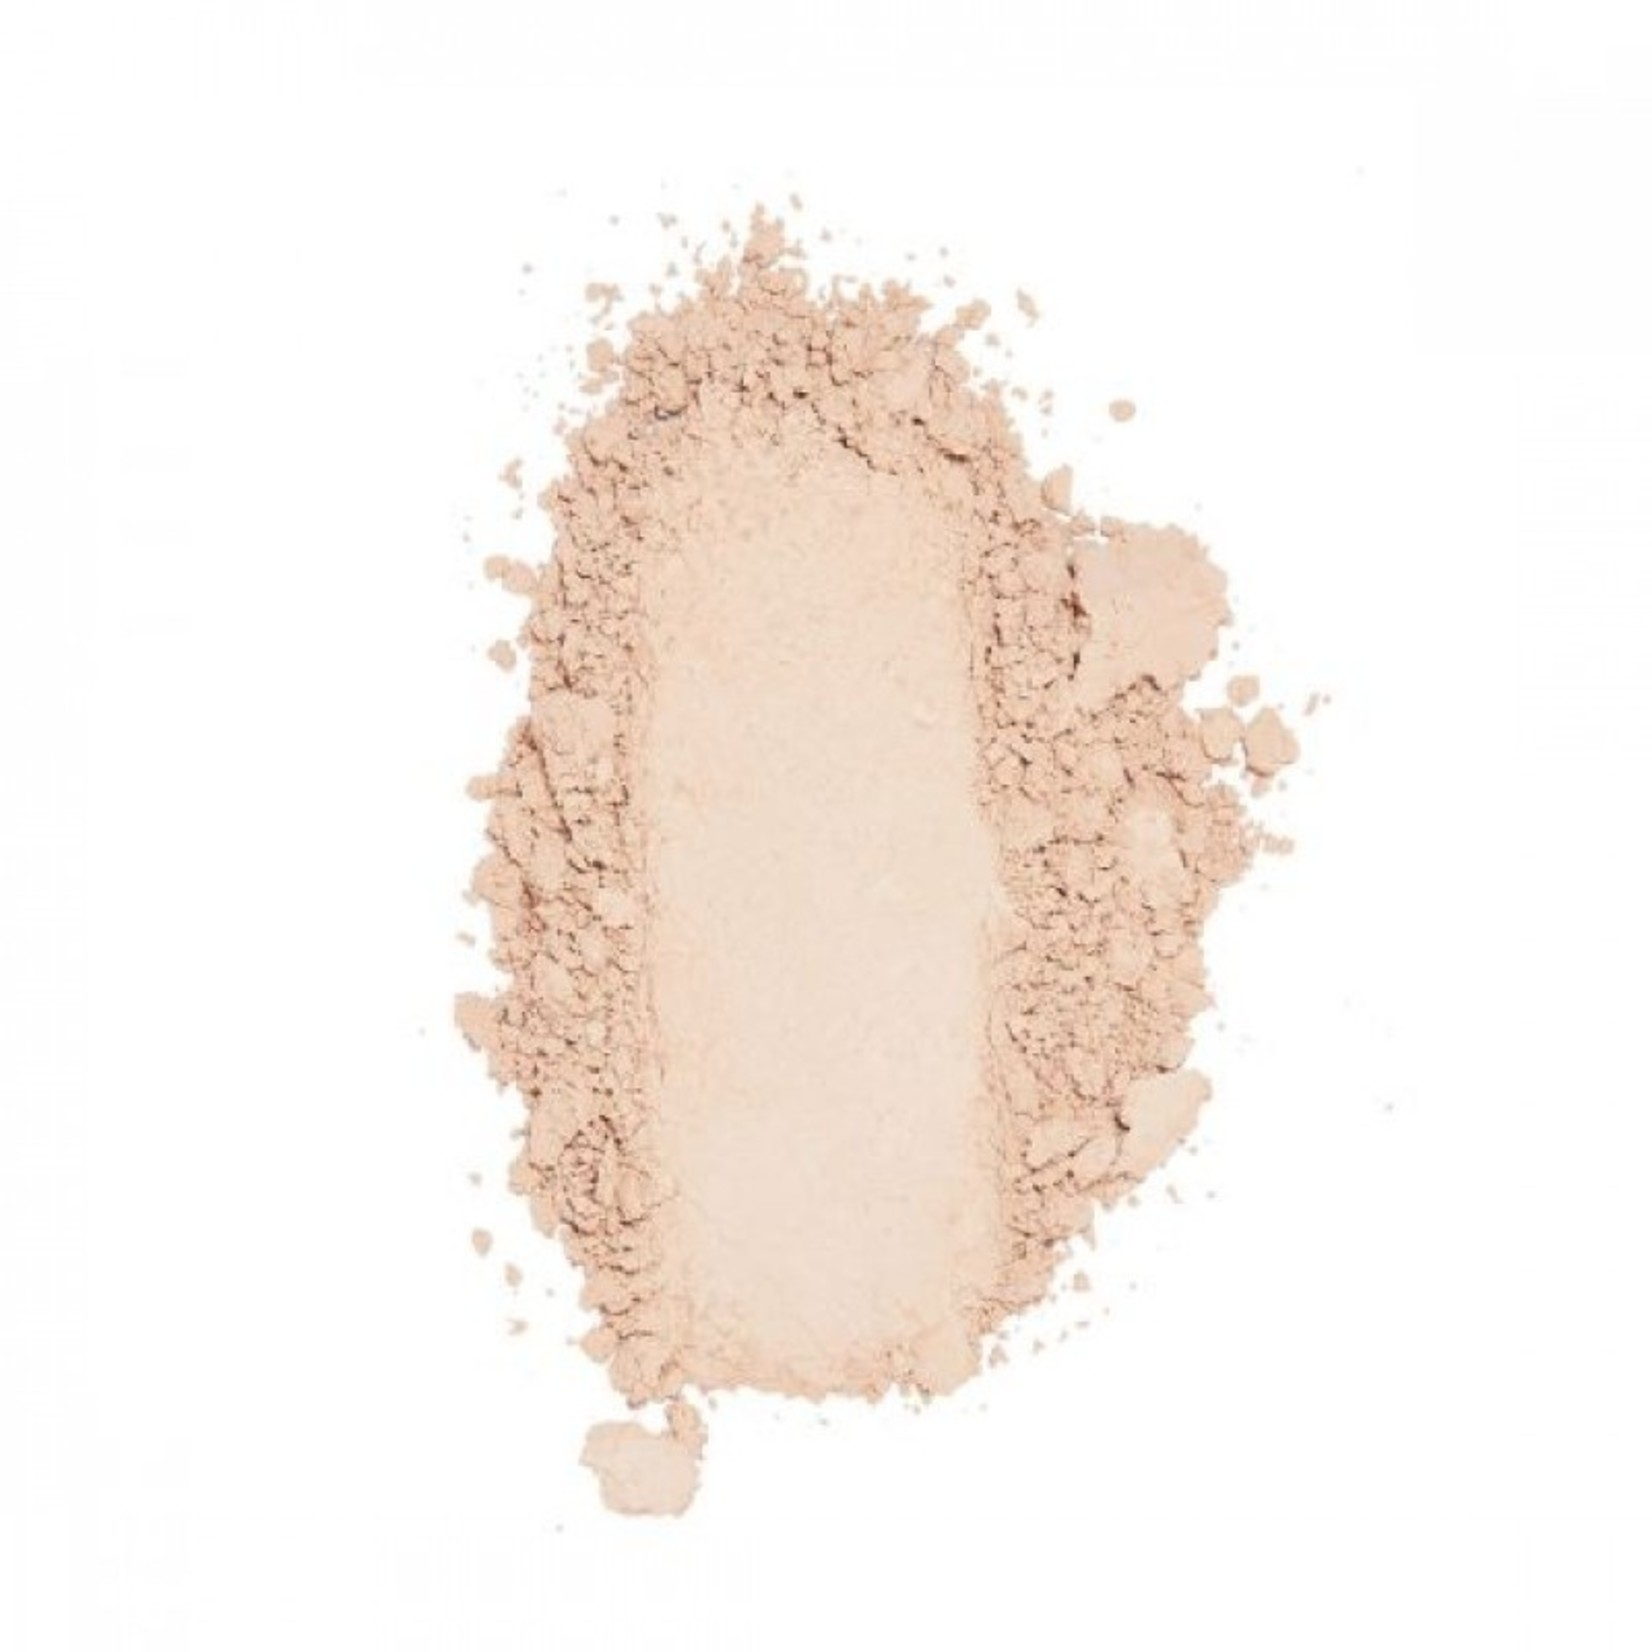 Bellapierre Mineral loose - foundation - Blondie